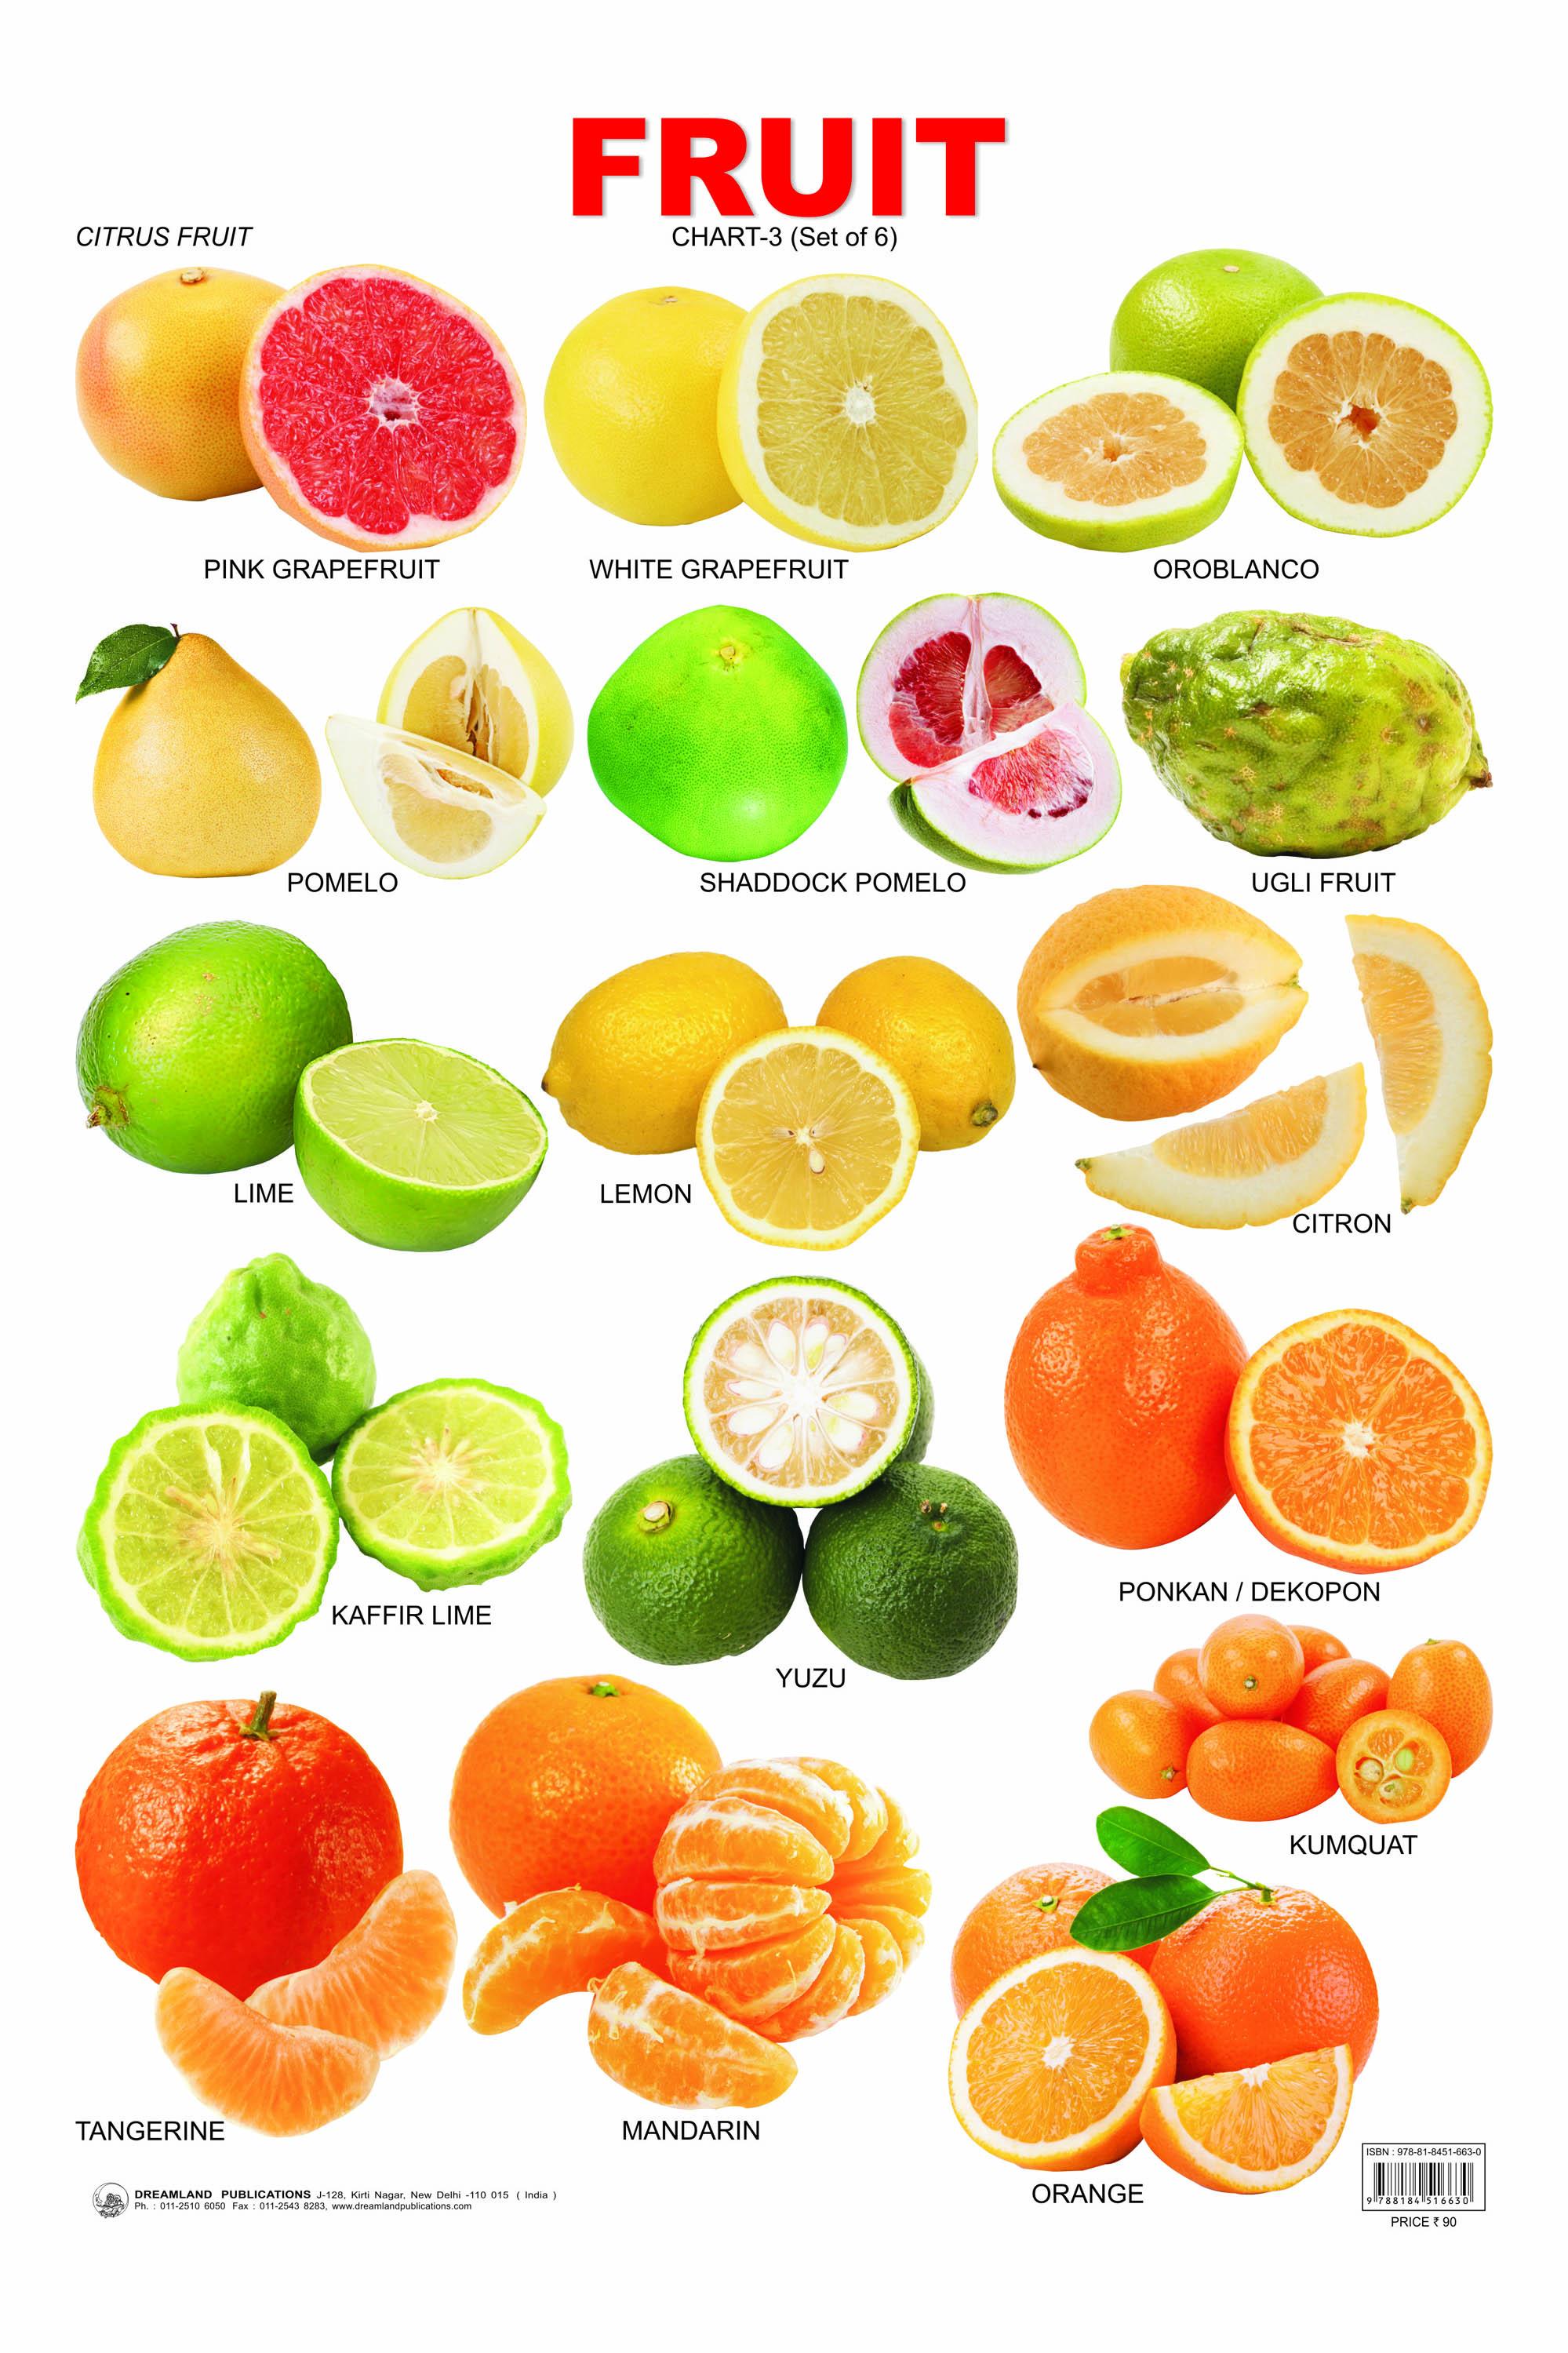 EB DESIGN Fruit ClipArt Best